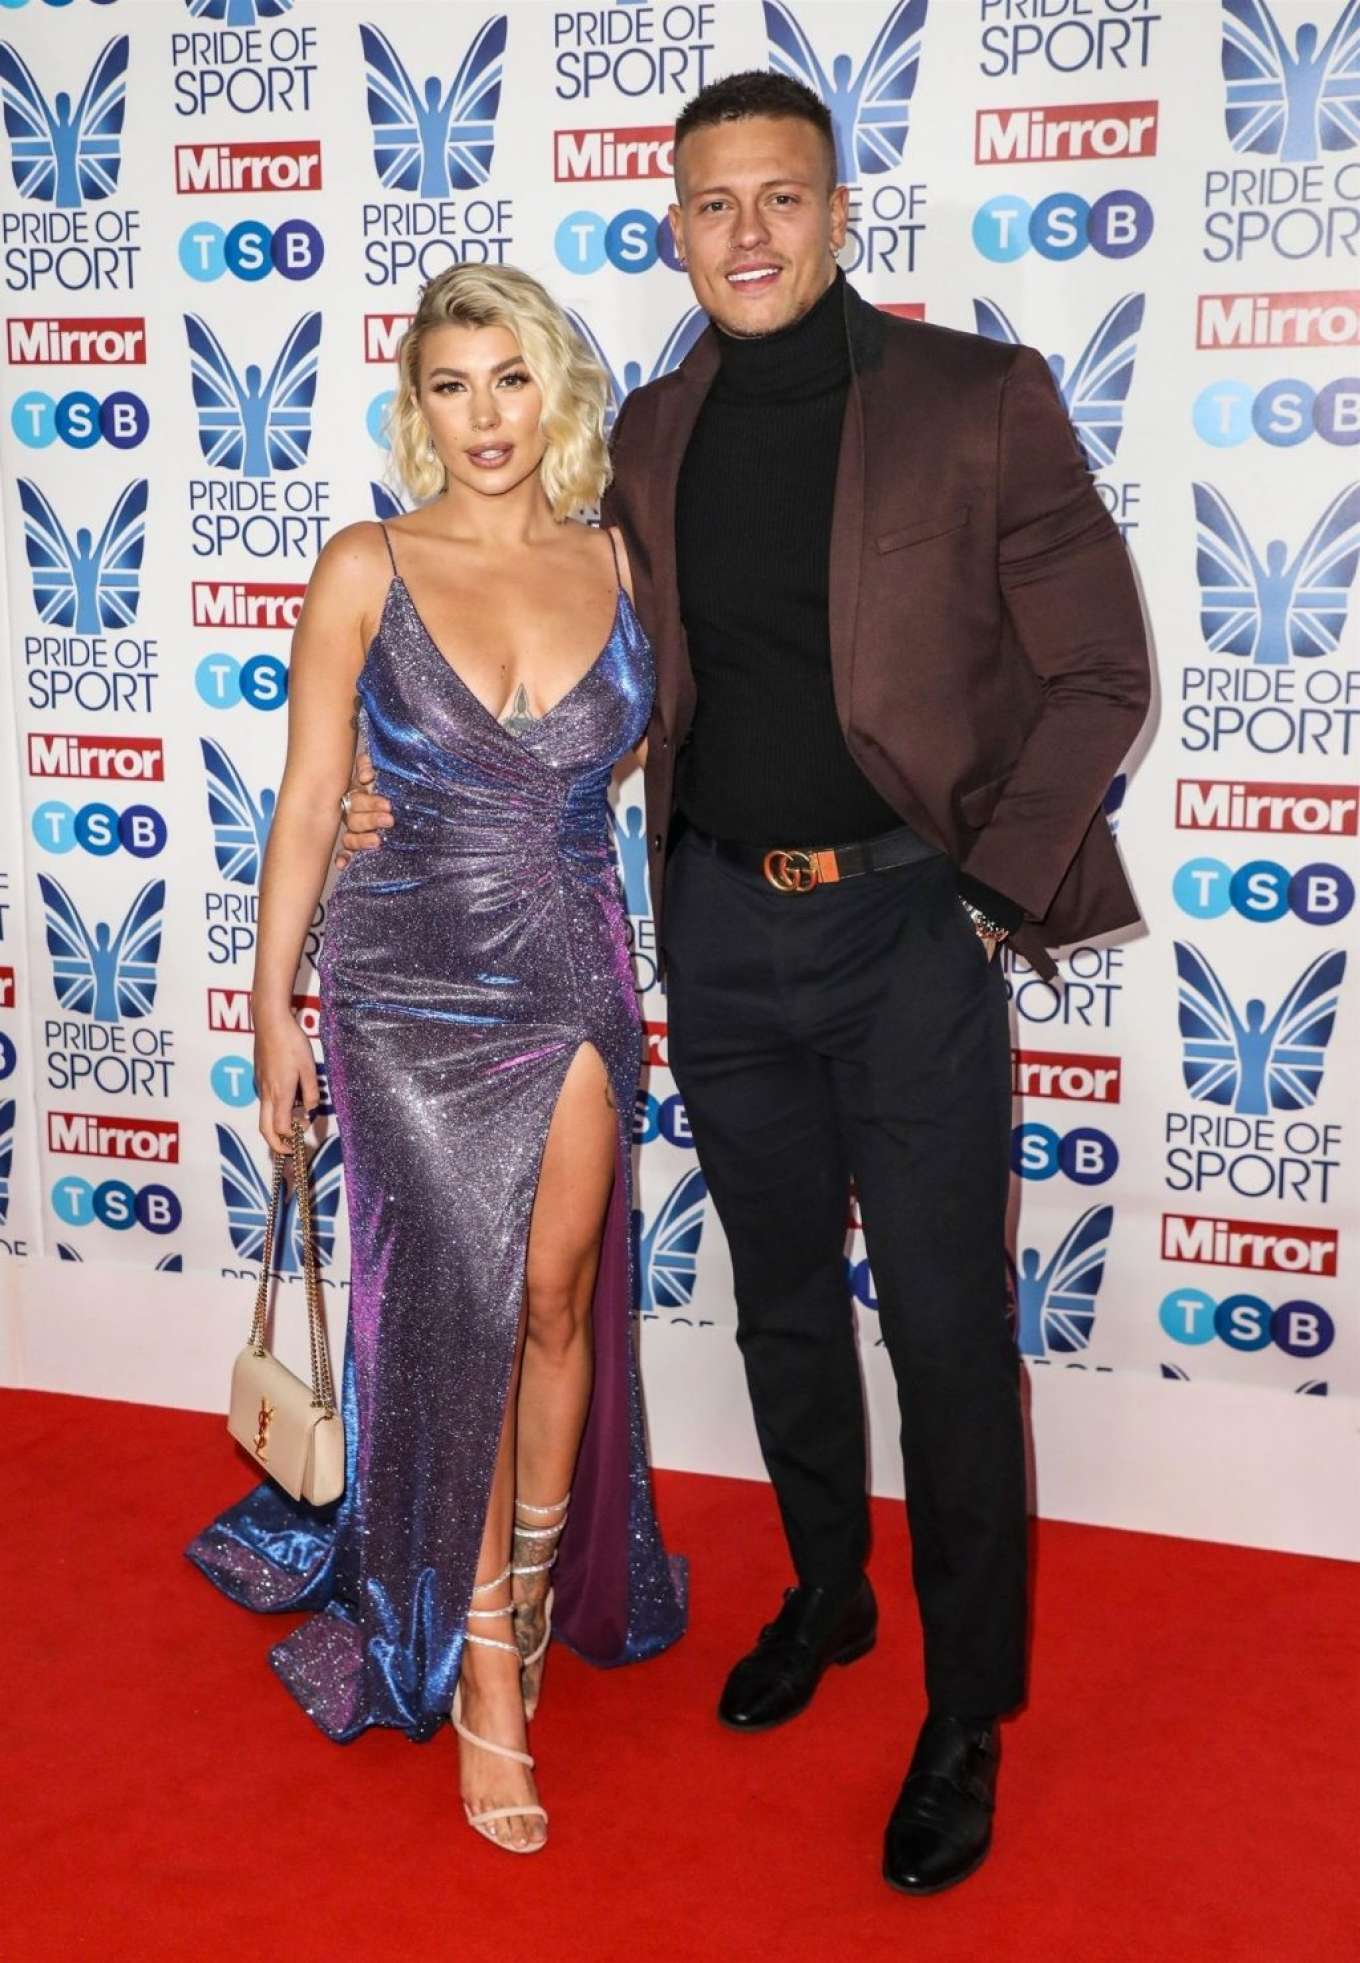 Olivia Buckland 2019 : Olivia Buckland – 2019 Daily Mirror Pride of Sport Awards-34